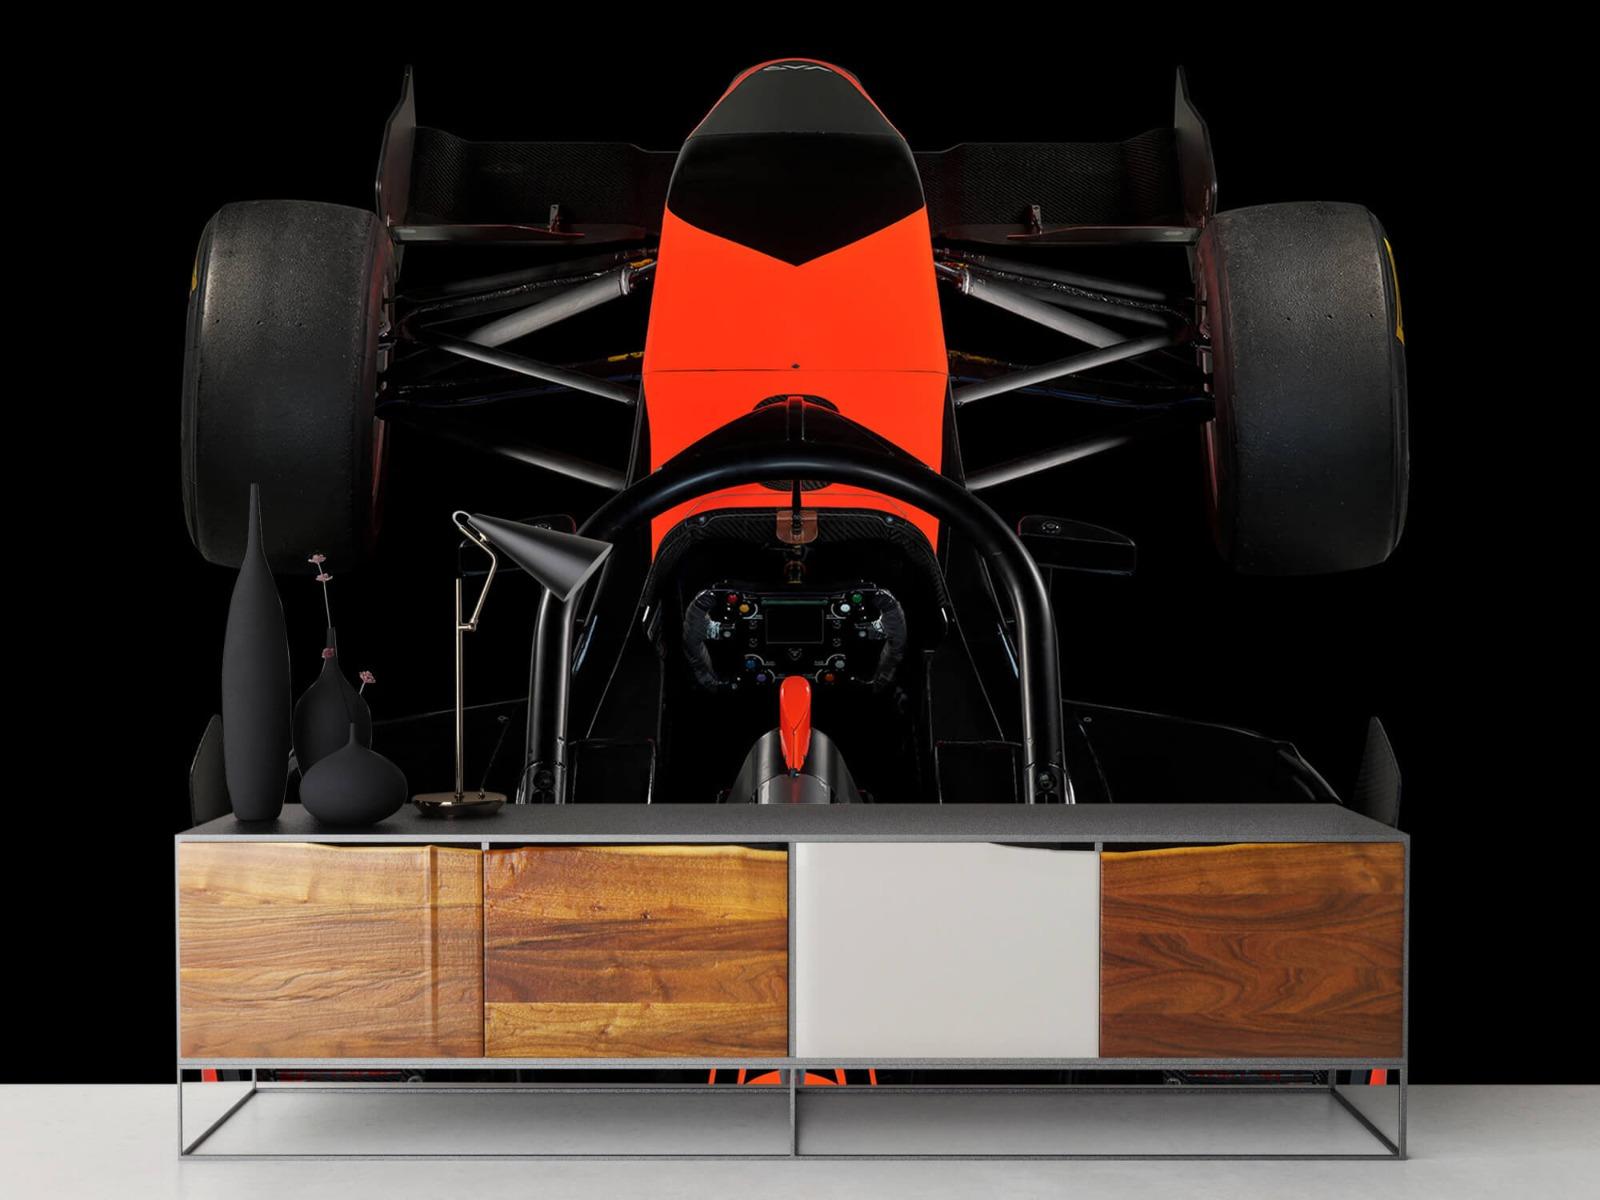 Sportauto's - Formule 3 - Cockpit view - dark - Tienerkamer 15